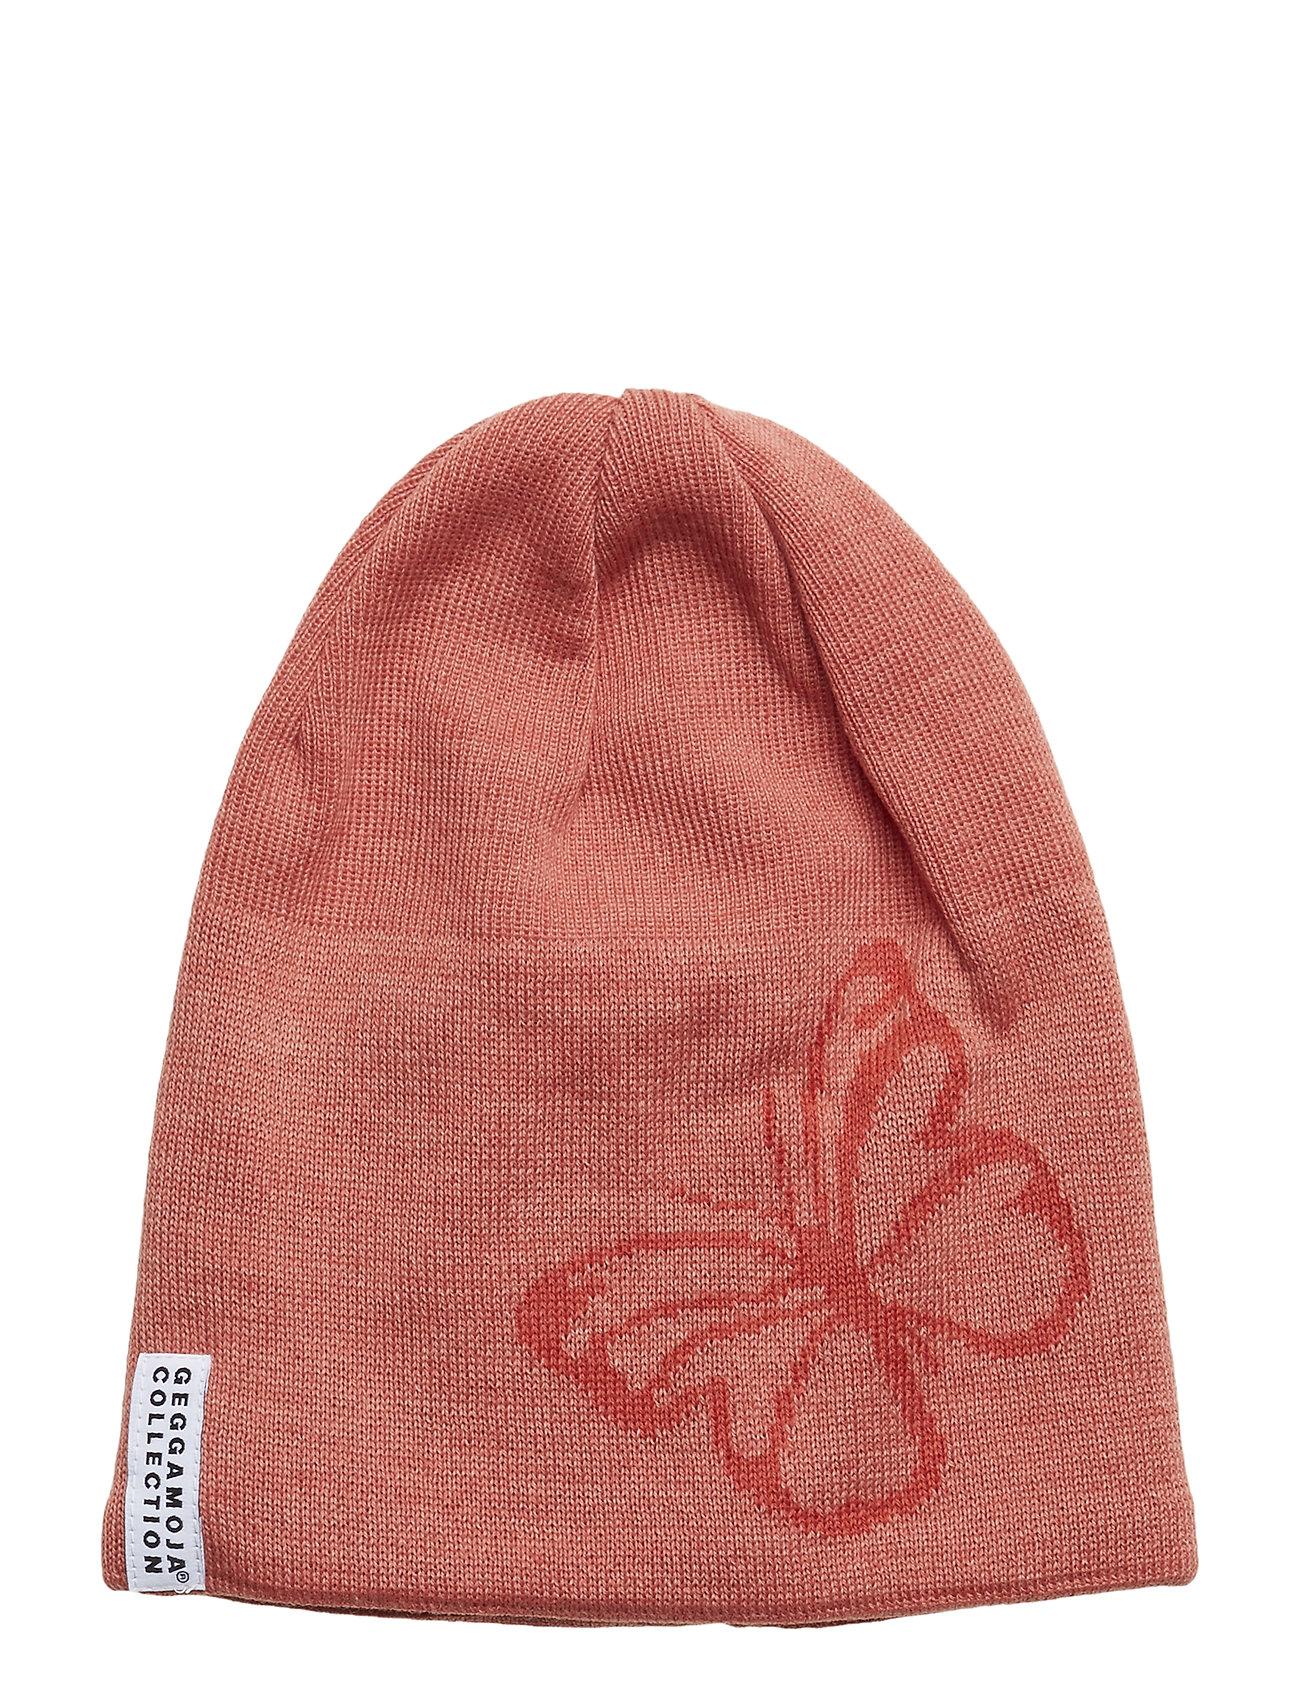 Image of Knitted Beanie Hat Lyserød GEGGAMOJA (3076486105)